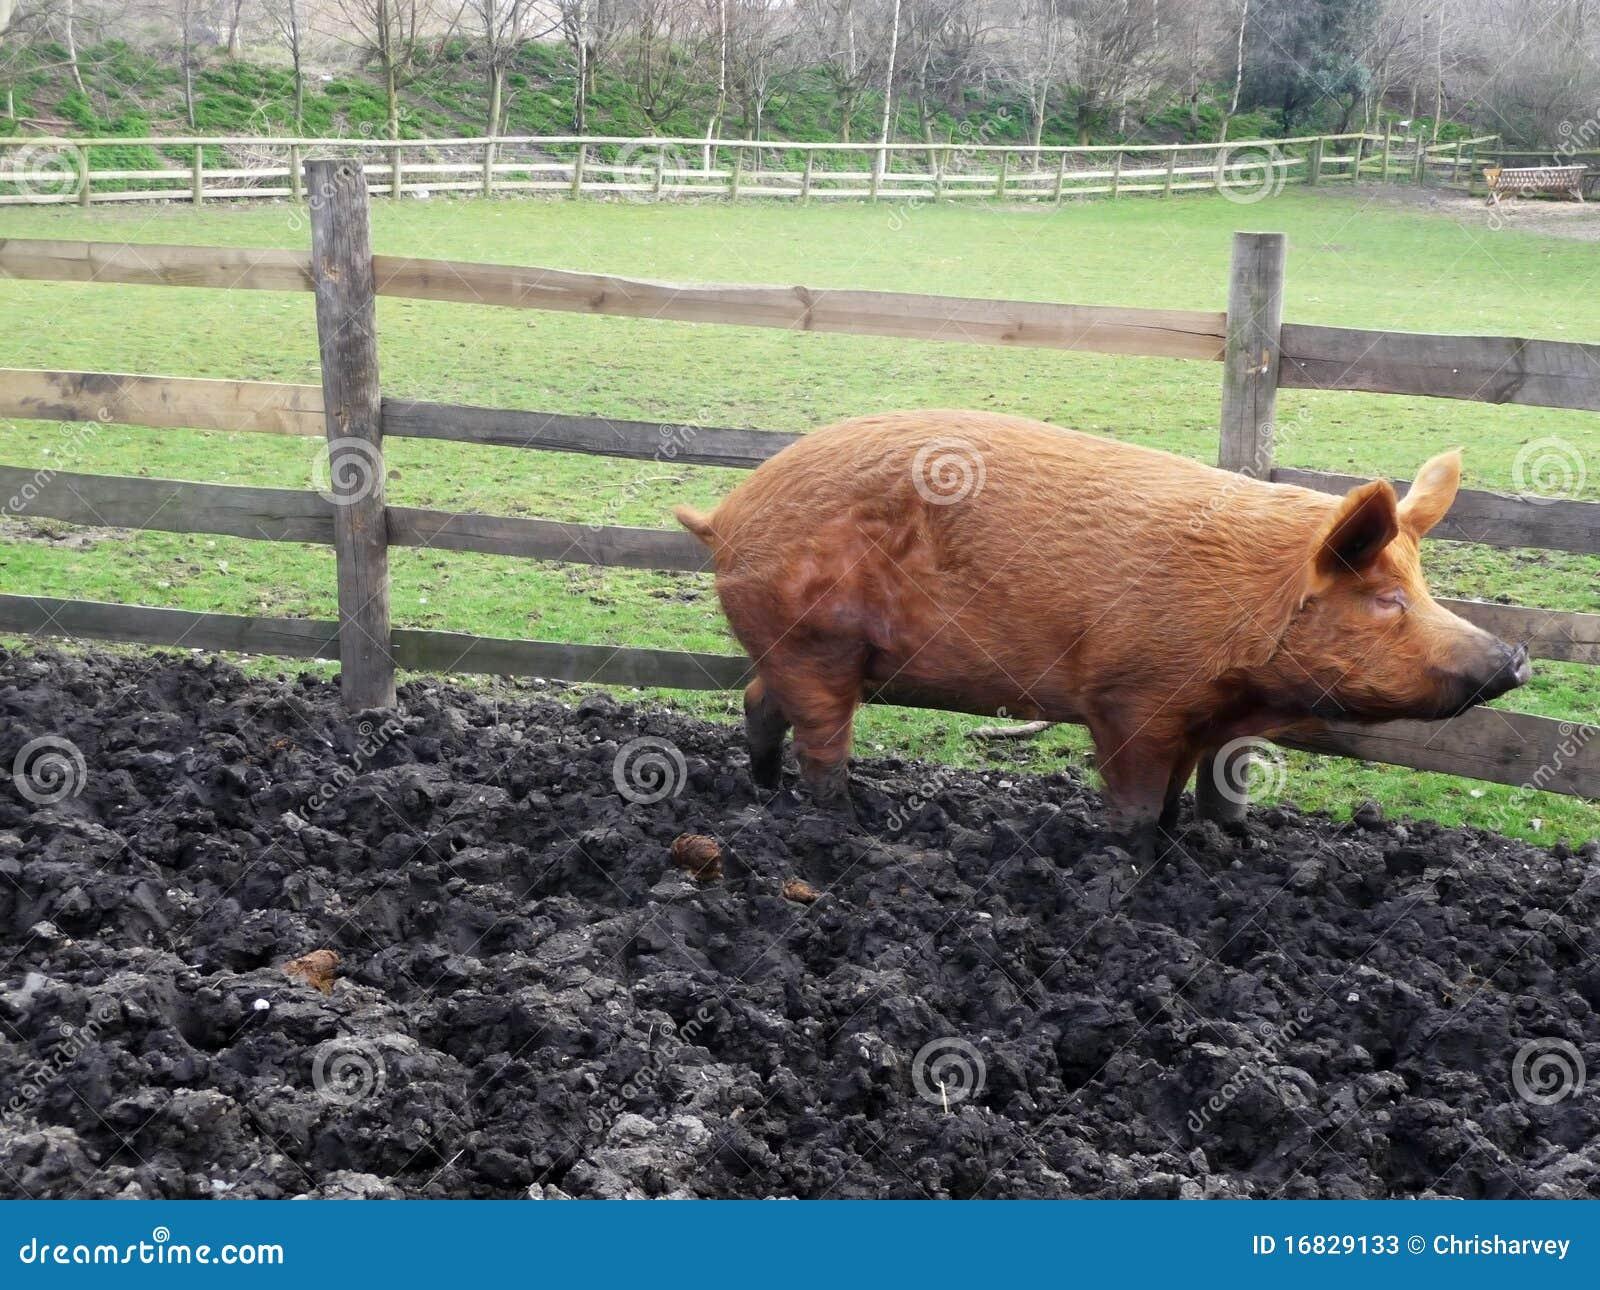 Big Muddy Pig Stock Photos Image 16829133